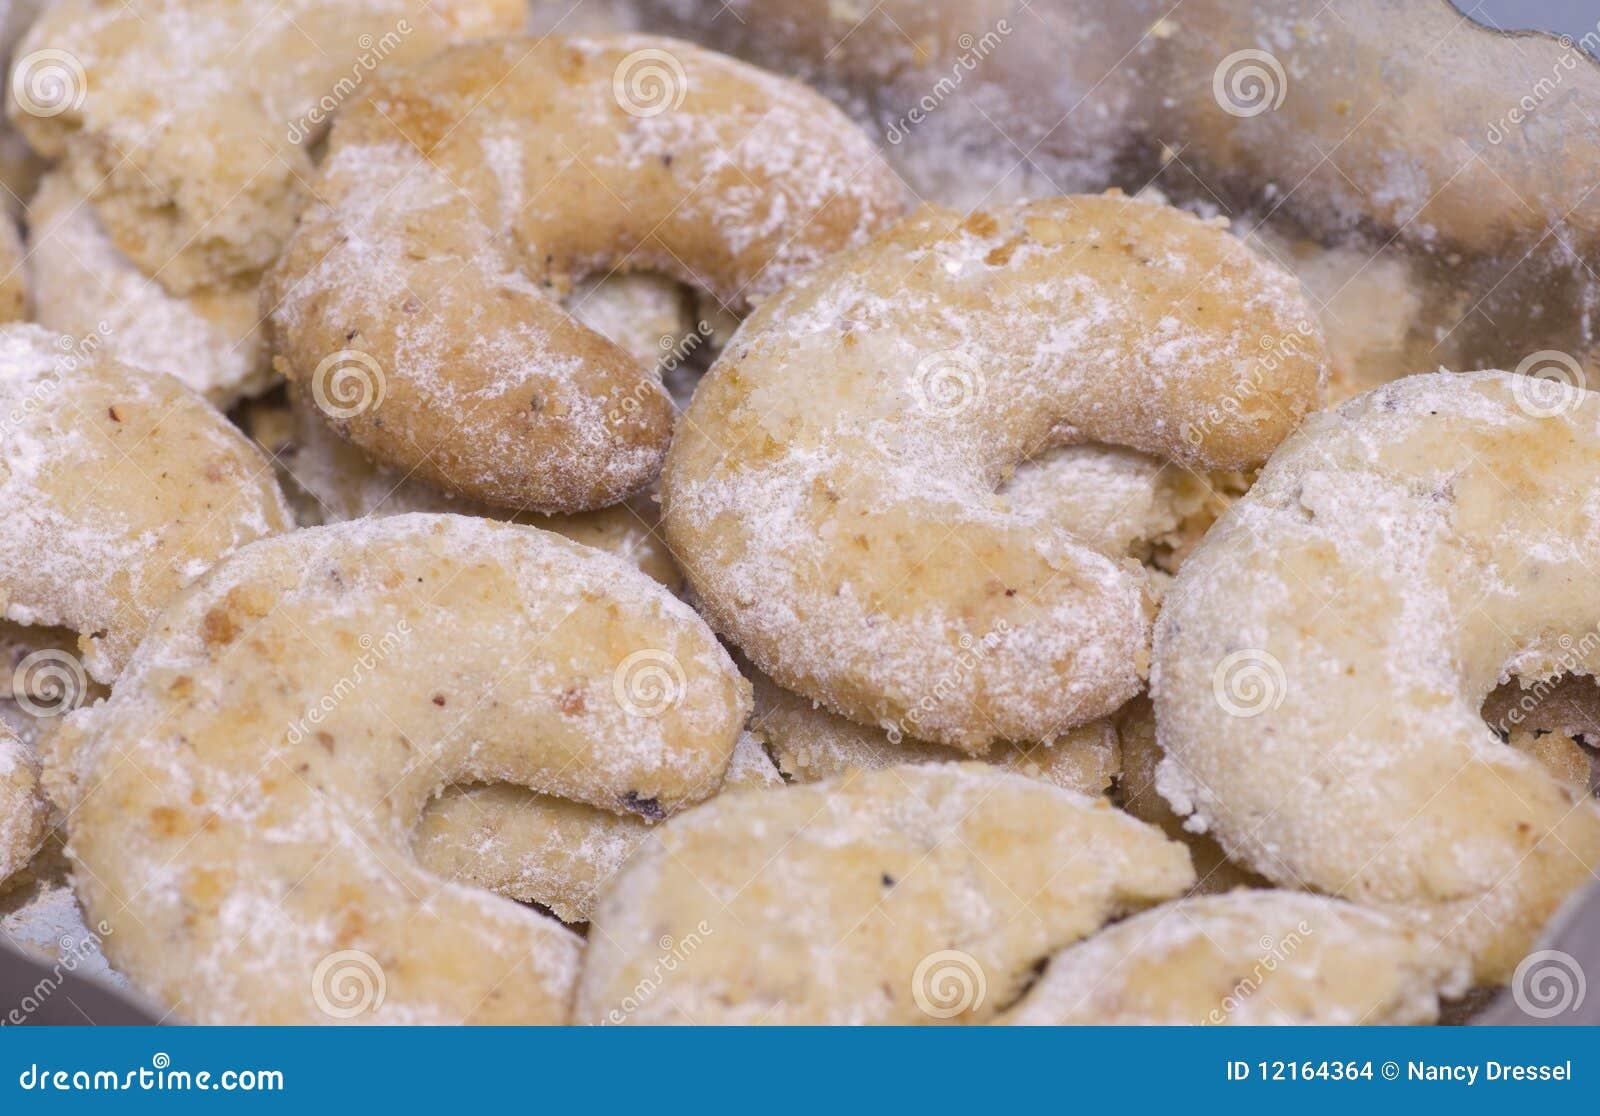 Some homemade christmas cookies as a closeup image vanilla kipferl S99GfXU4